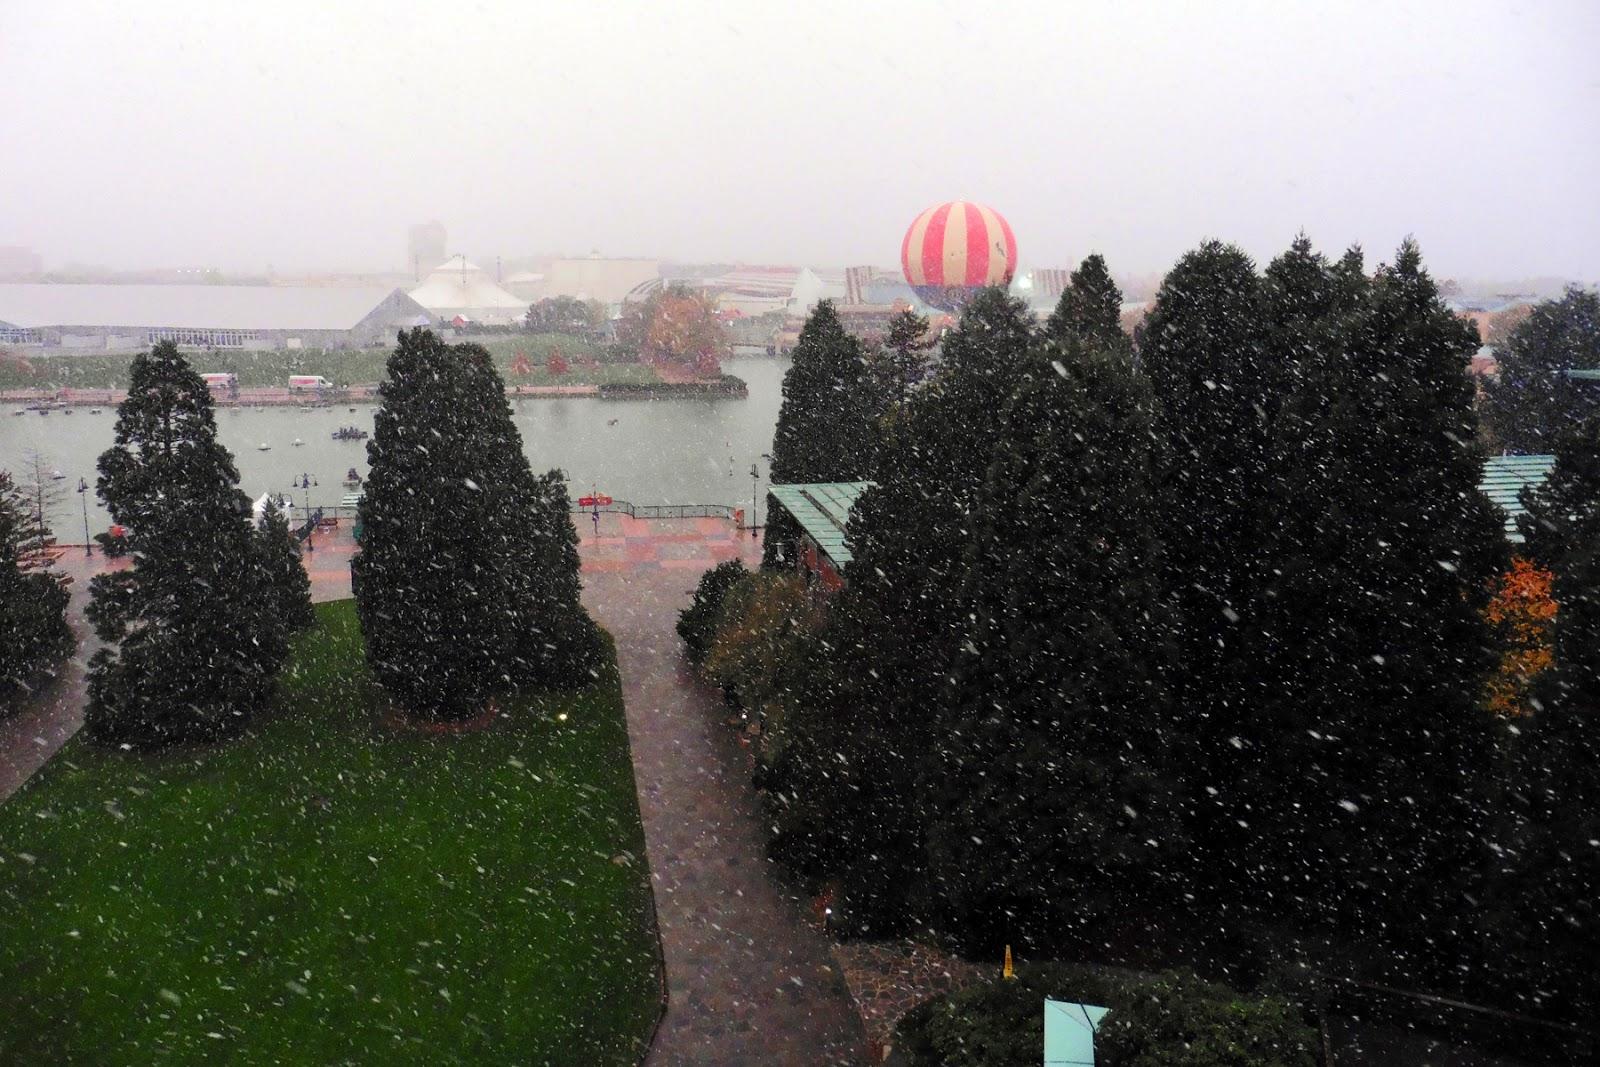 Snow flurries from Disney's Sequoia Lodge at Disneyland Paris